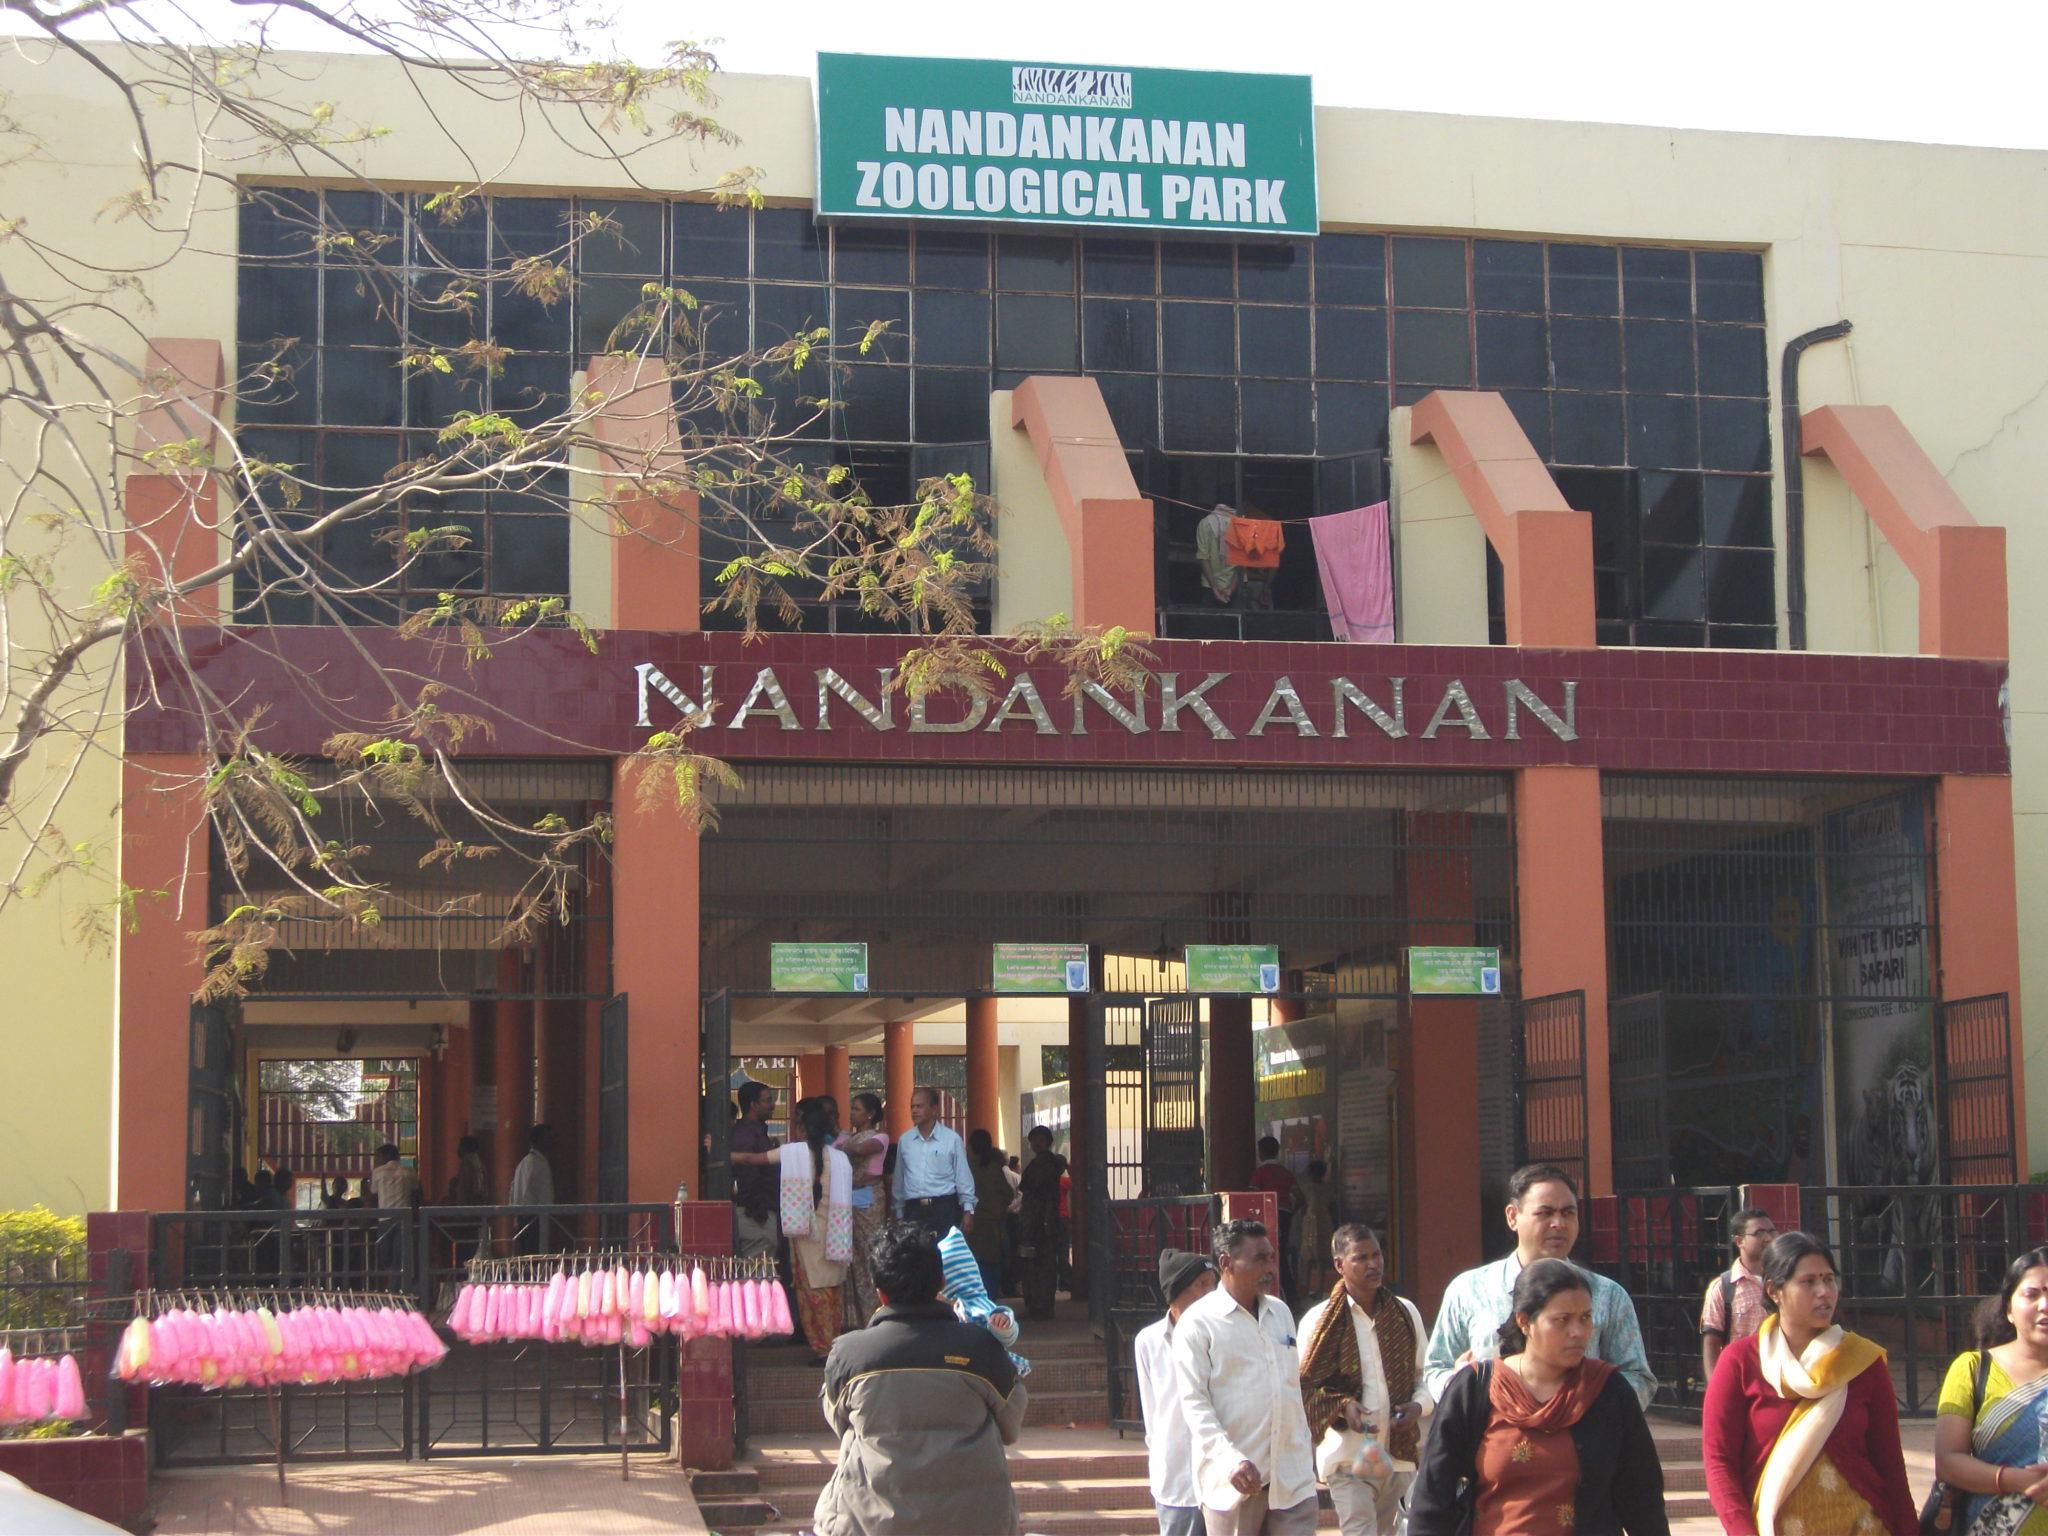 Nandankanan Zoological Park To Closed Till 15th May For Corona